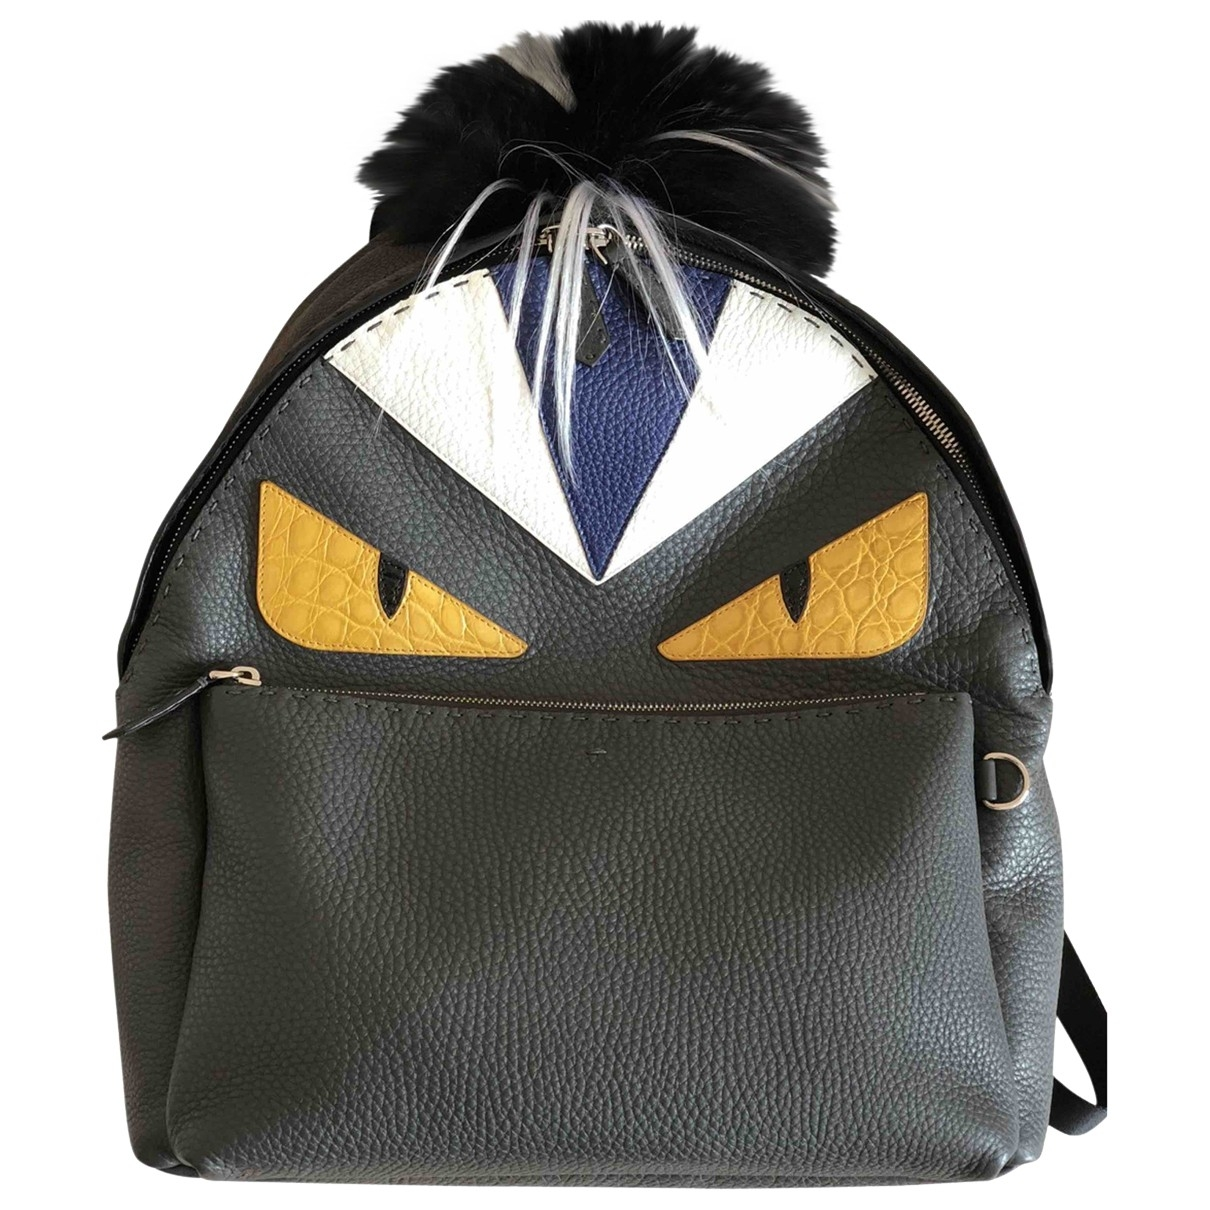 Fendi \N Multicolour Leather backpack for Women \N